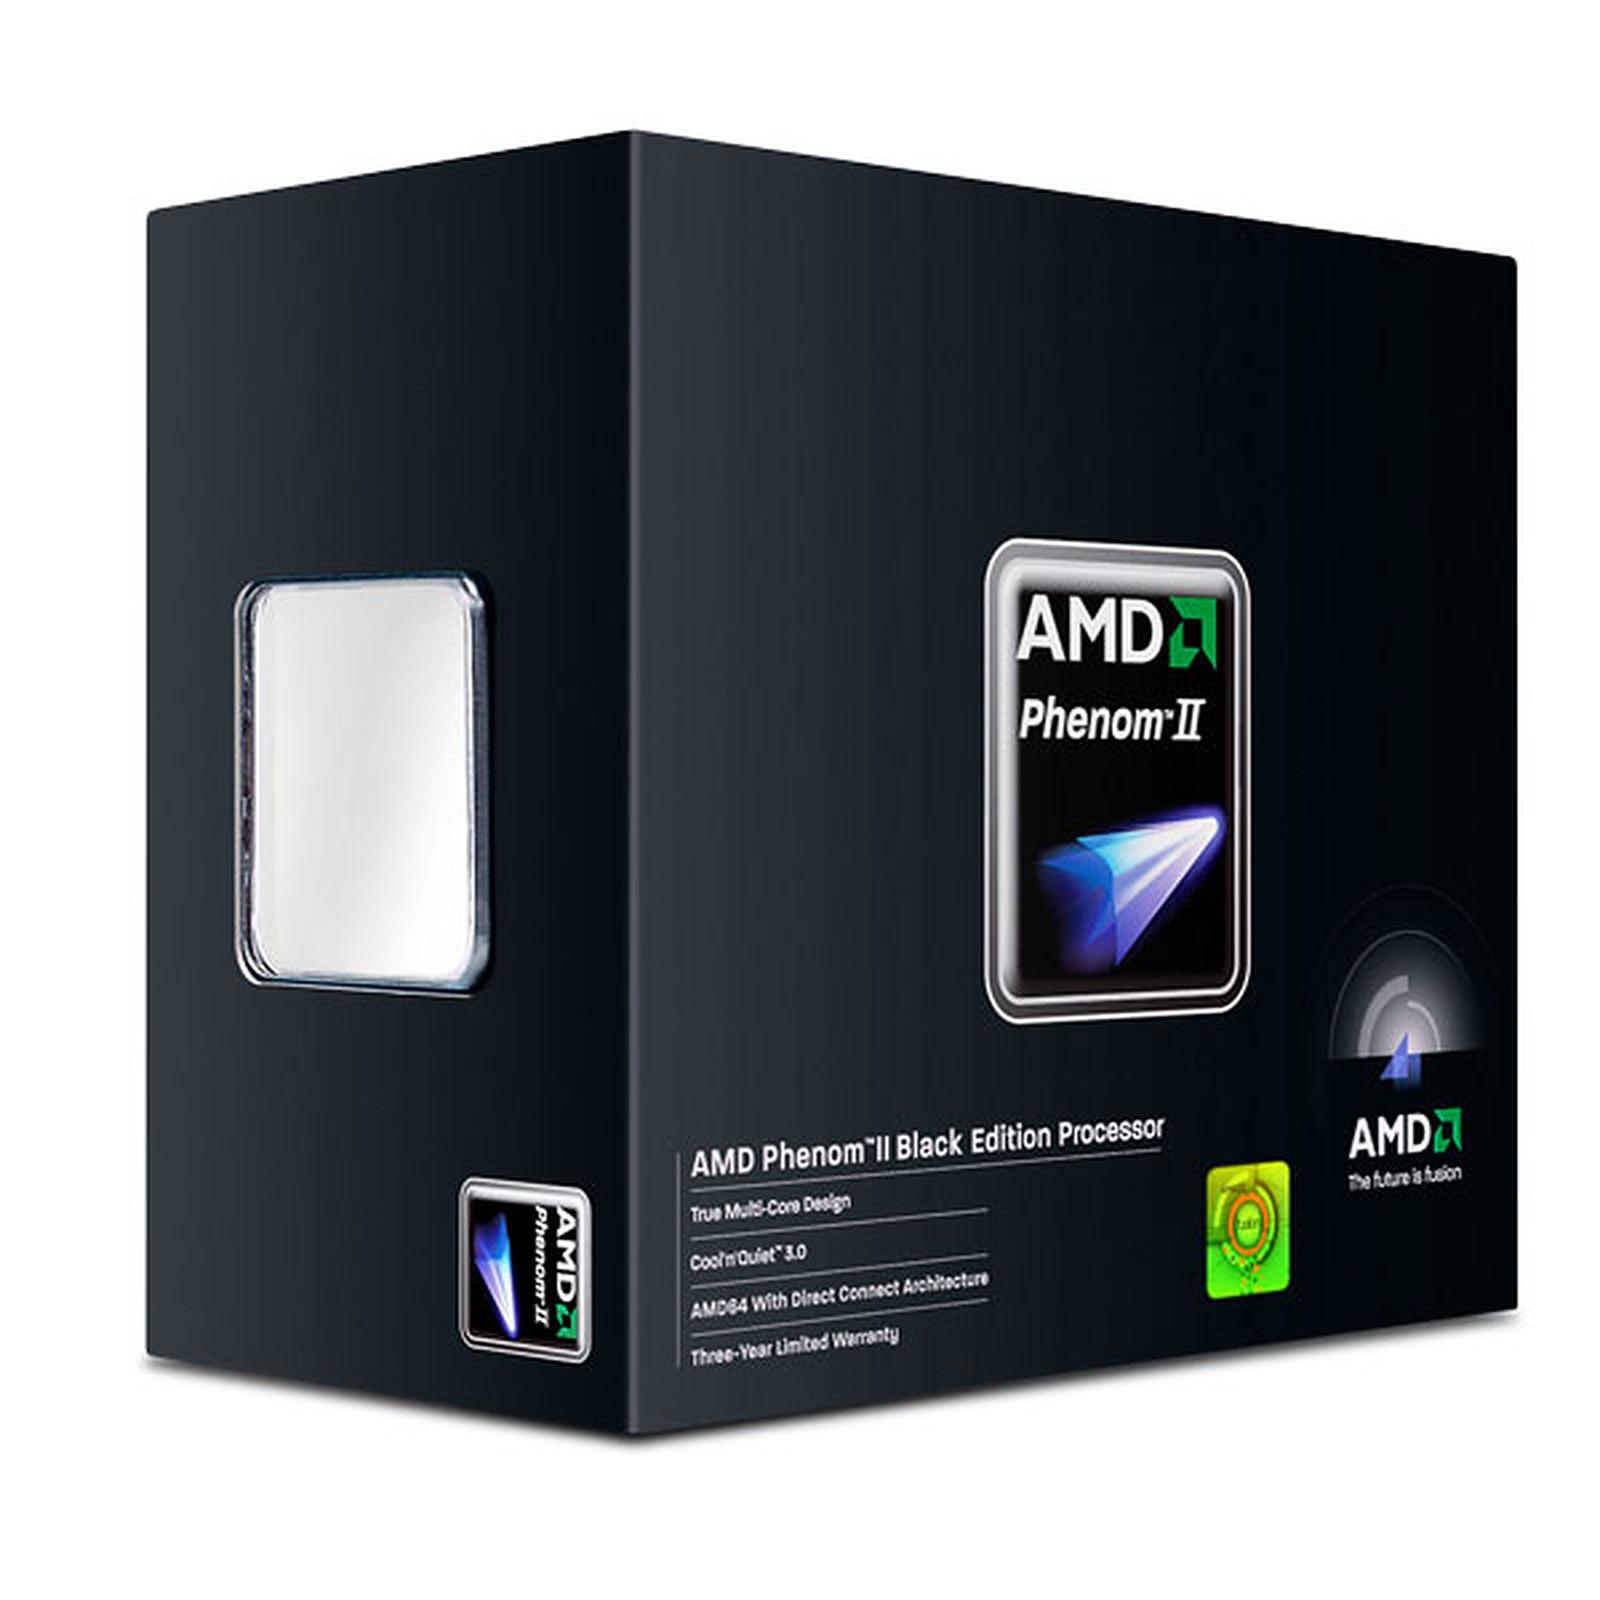 AMD Phenom II X4 975 Black Edition (3.6 GHz)